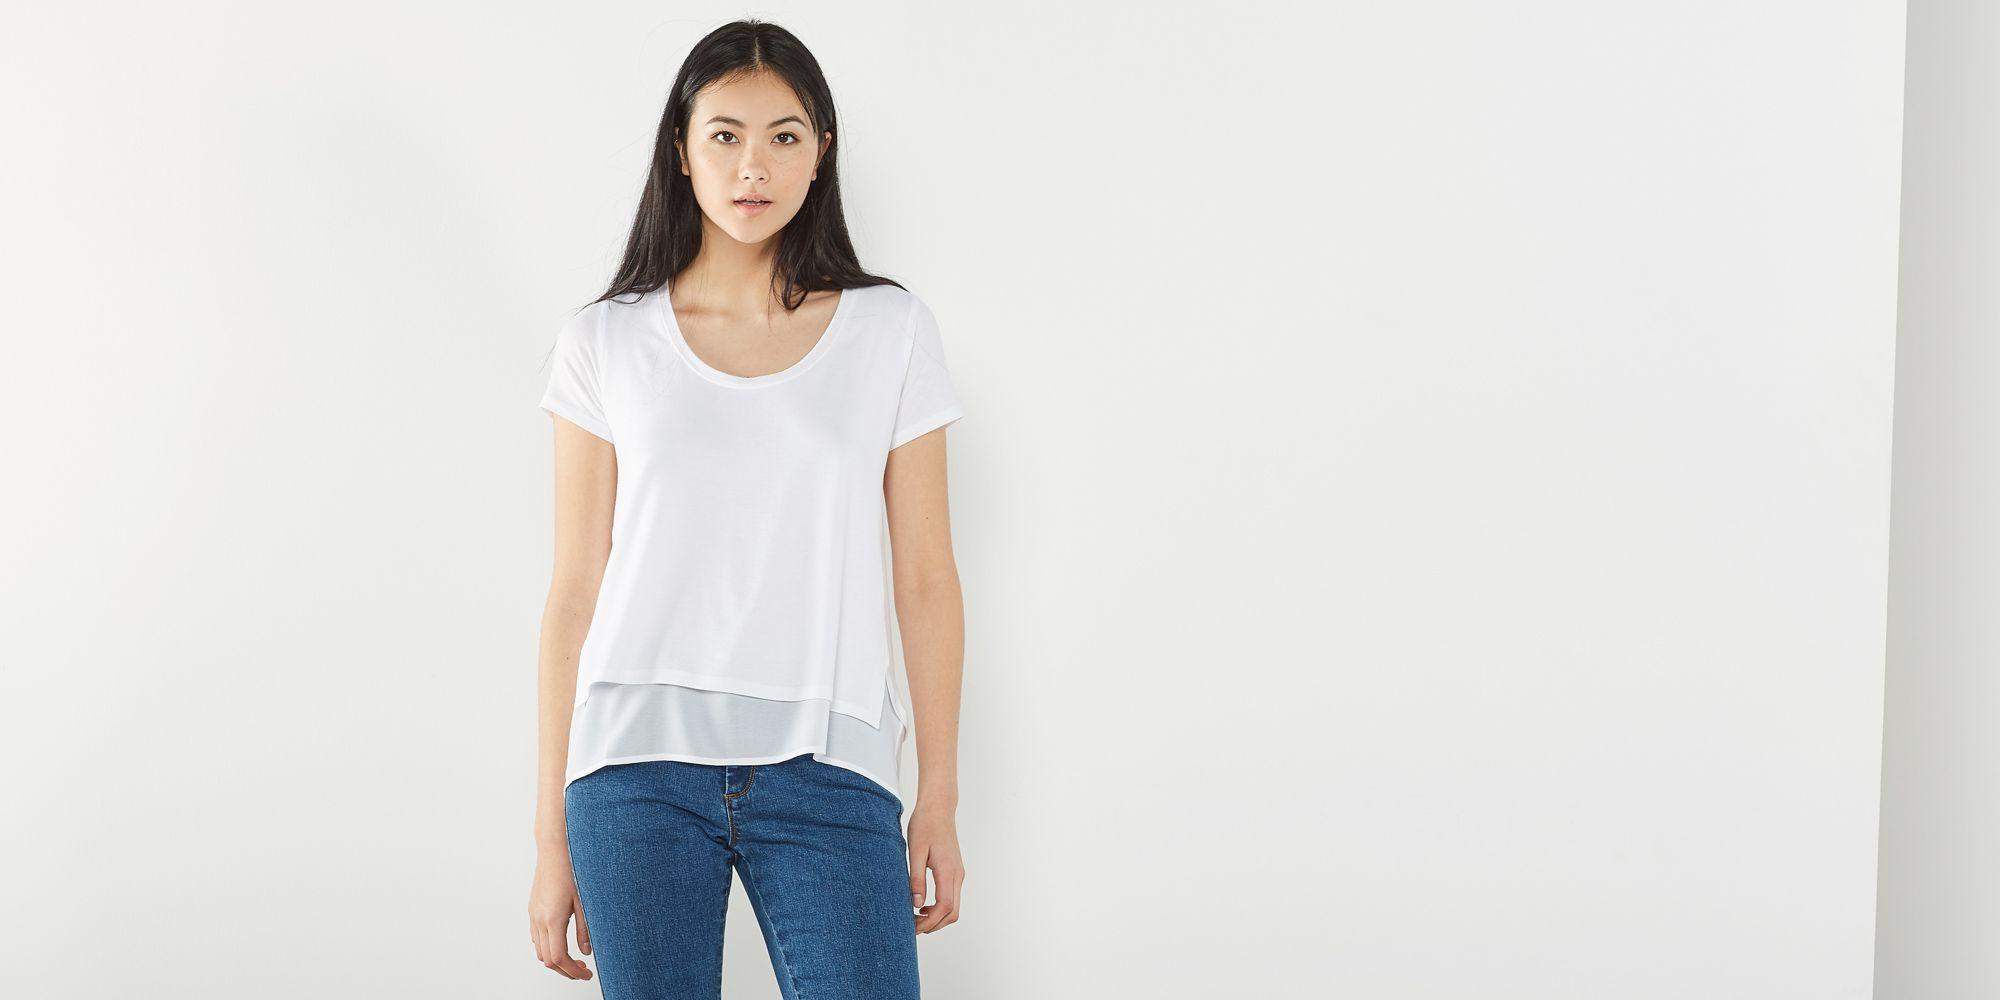 Camiseta lisa capa 616655W-17235-1